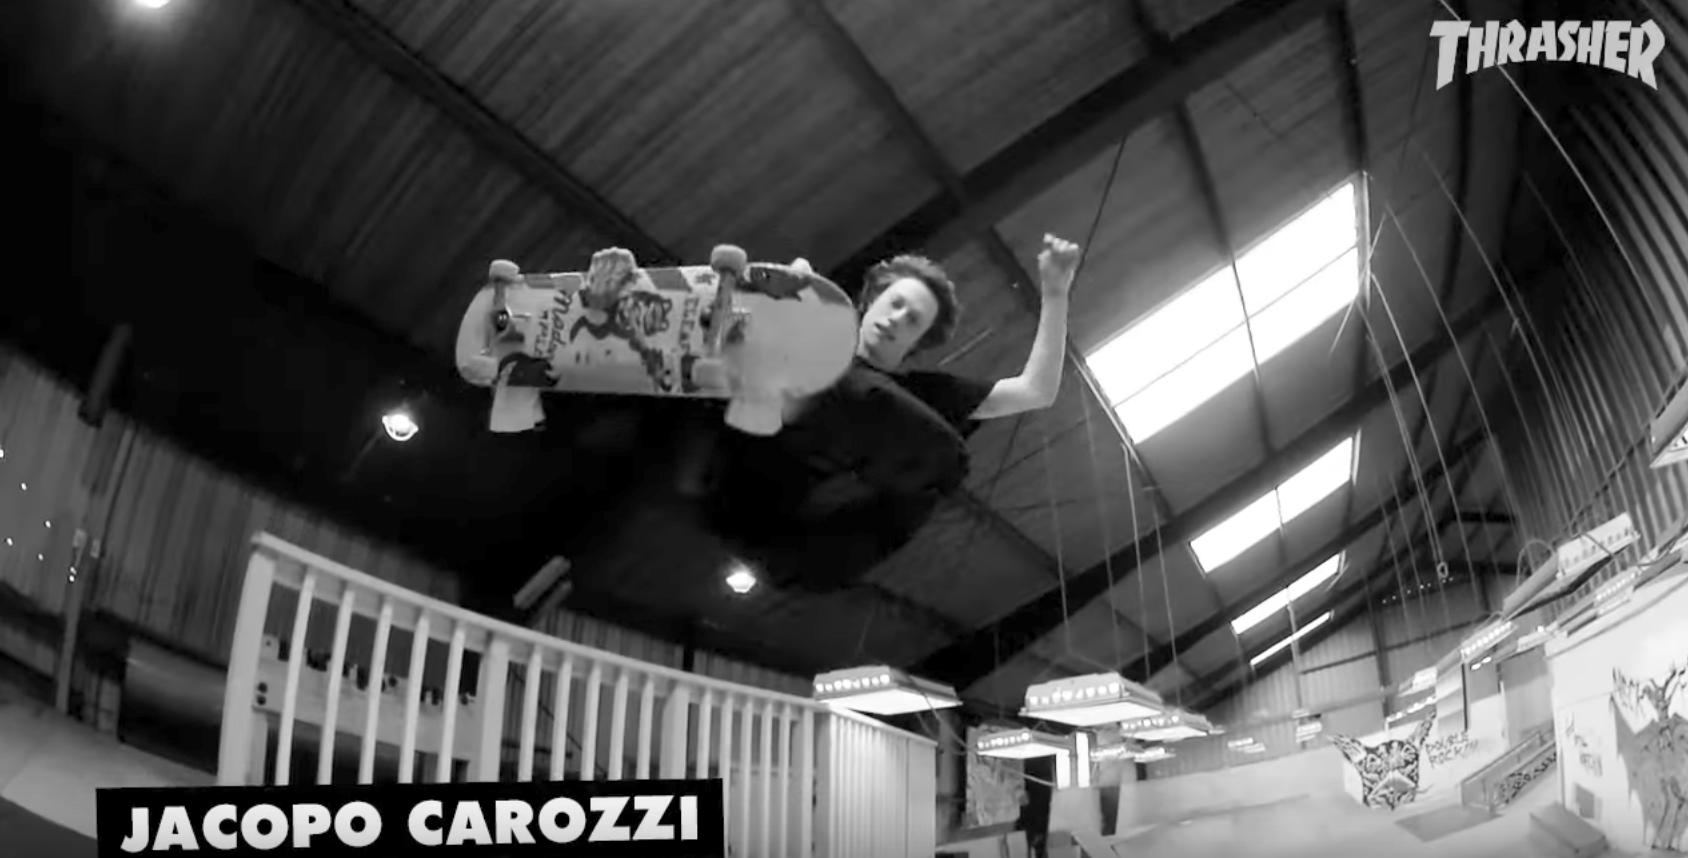 Jacopo Carozzi - Double Rock